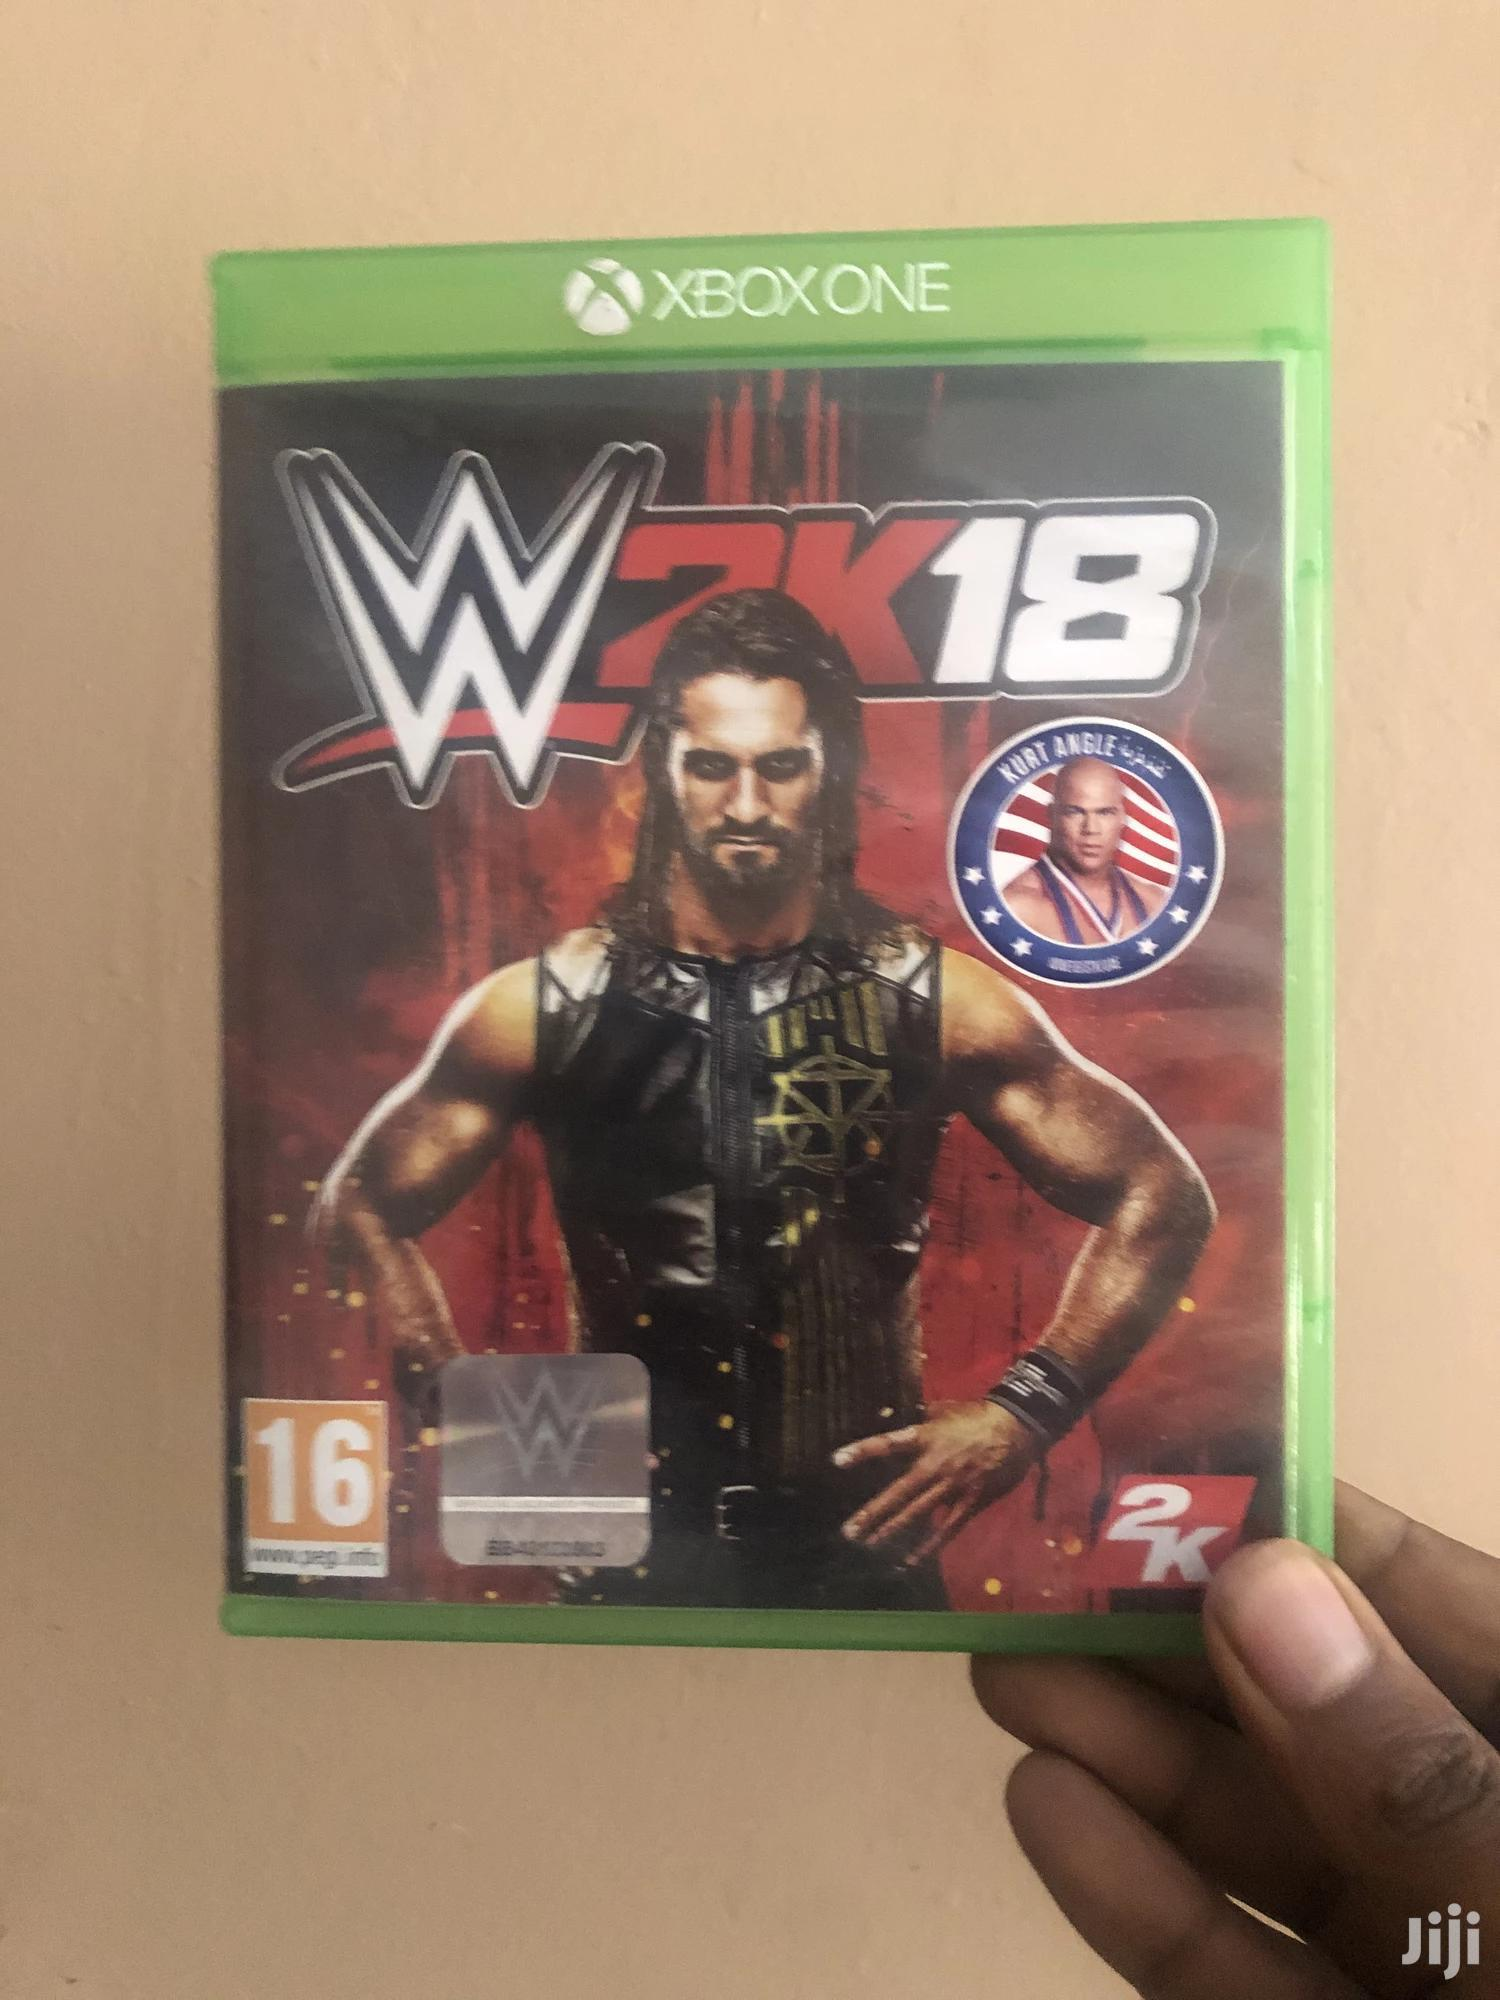 Xbox Cd Games